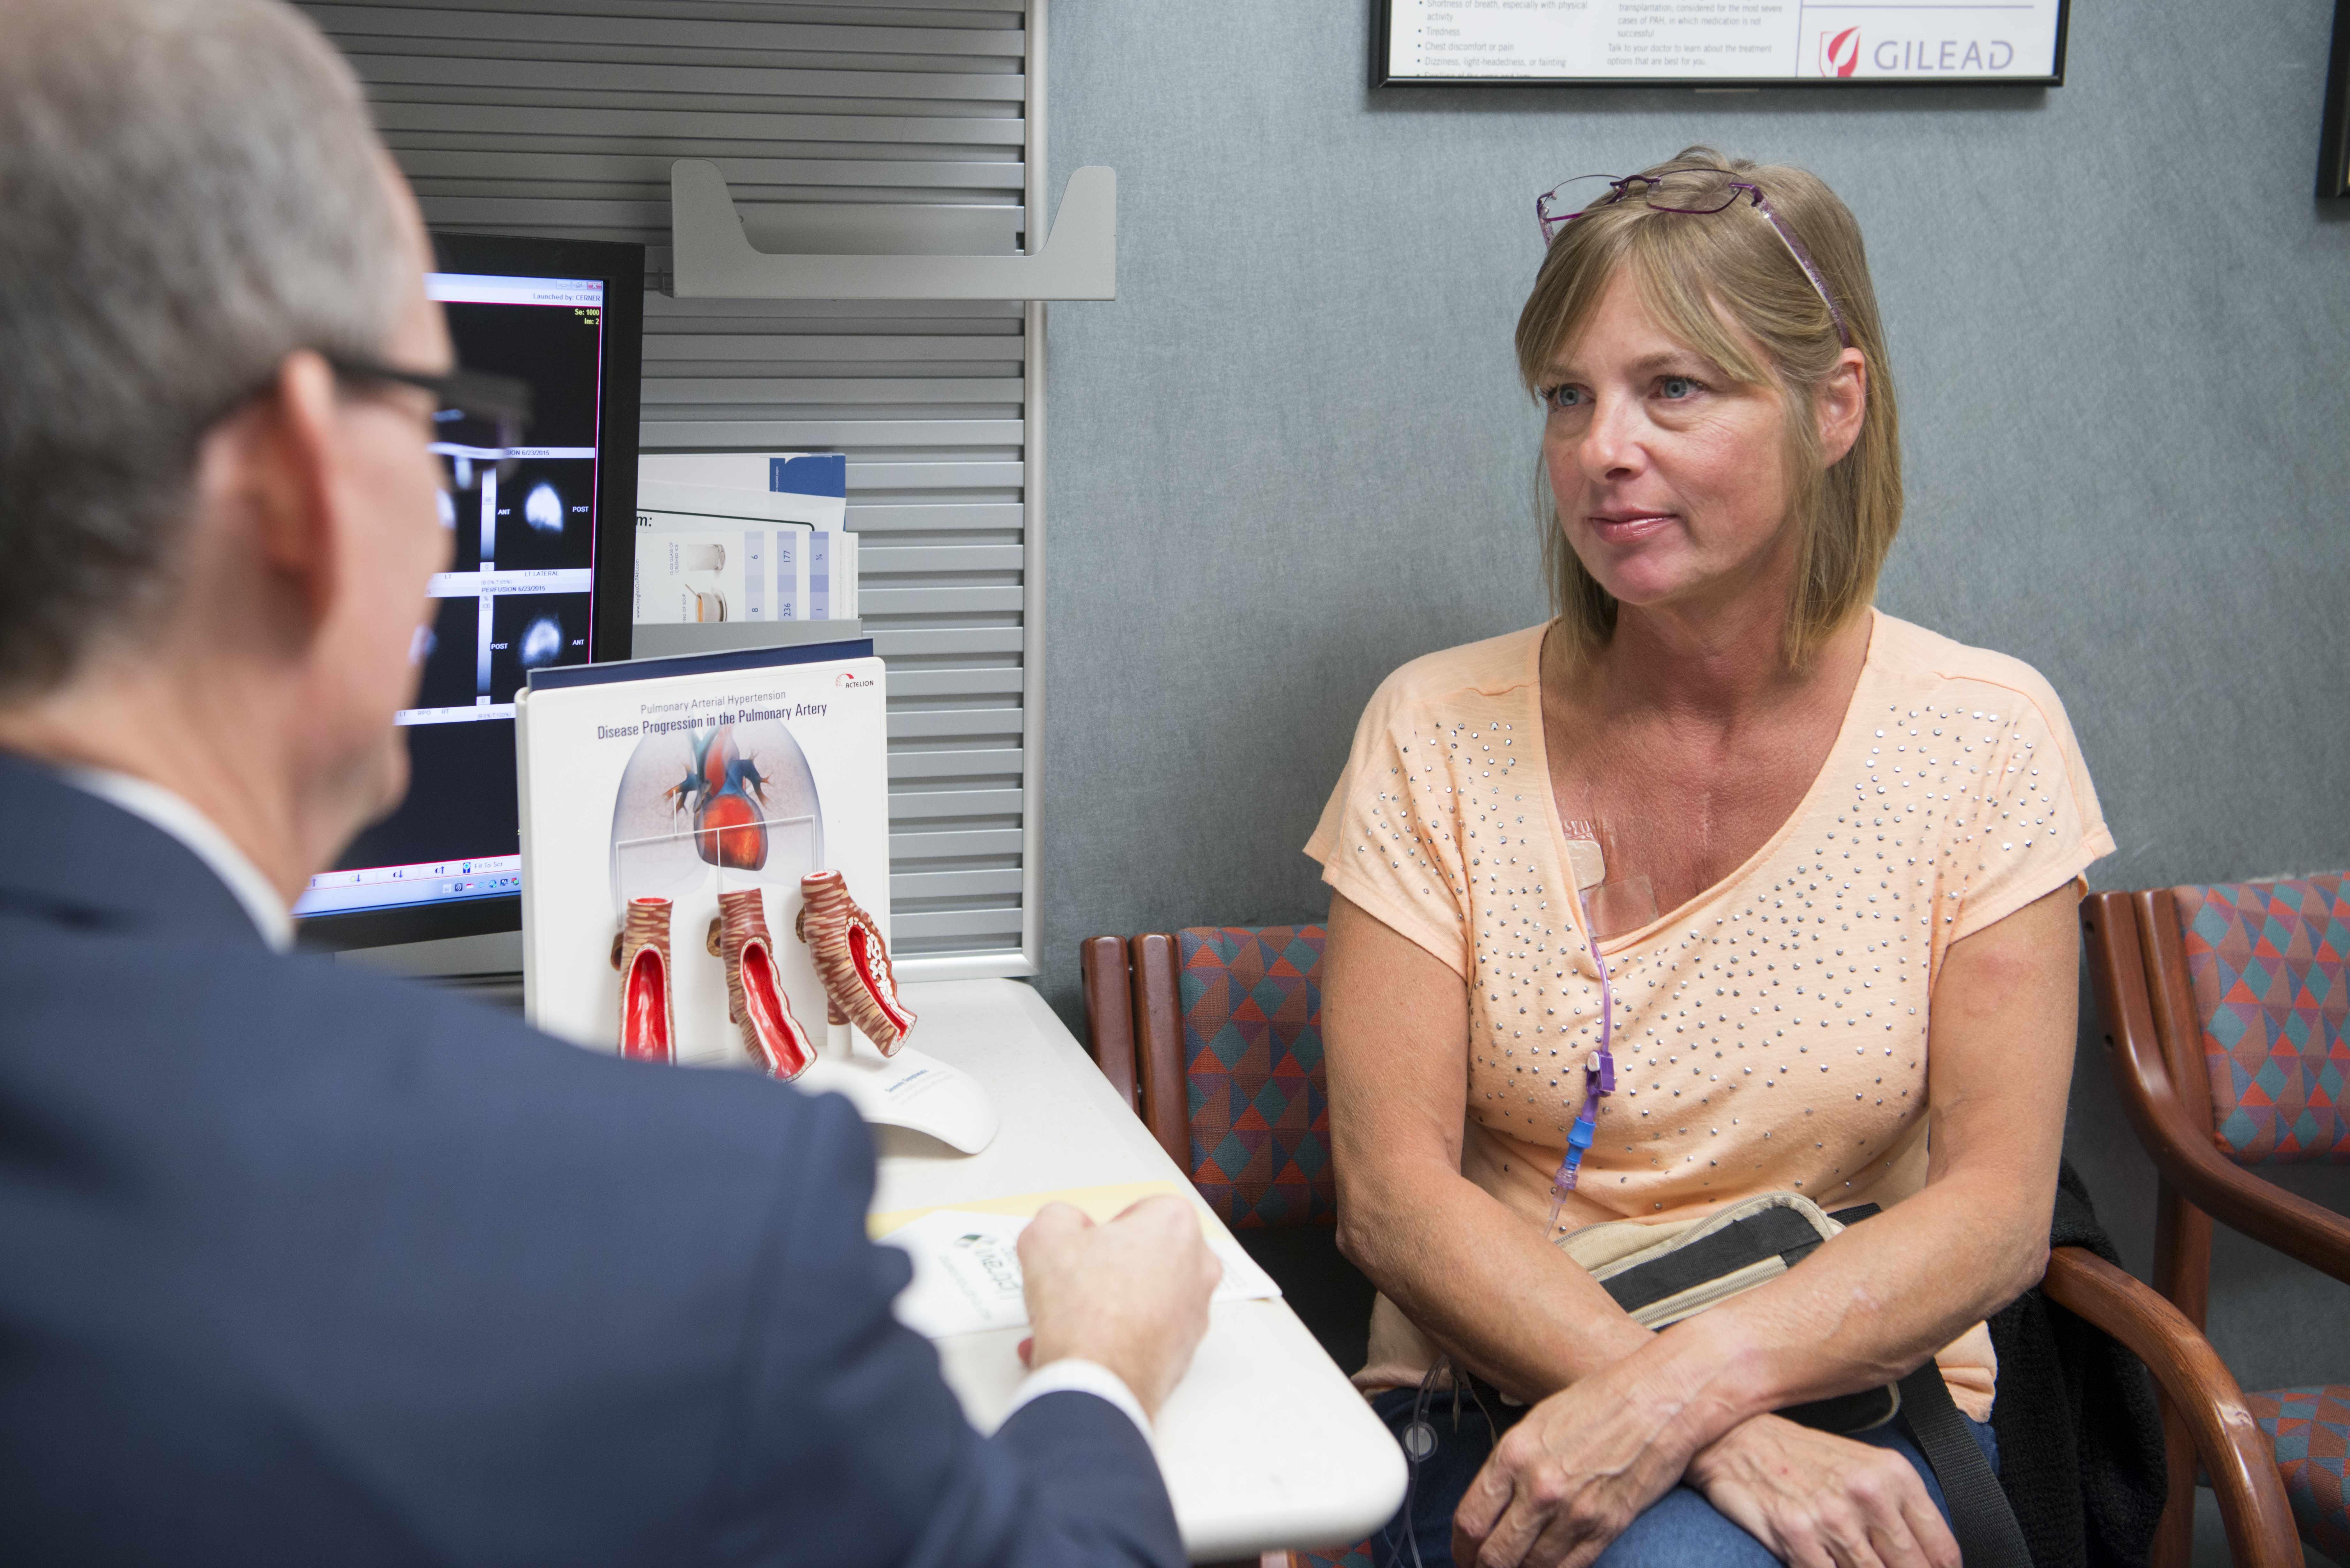 Laura Floecker - Pulmonary Hypertension